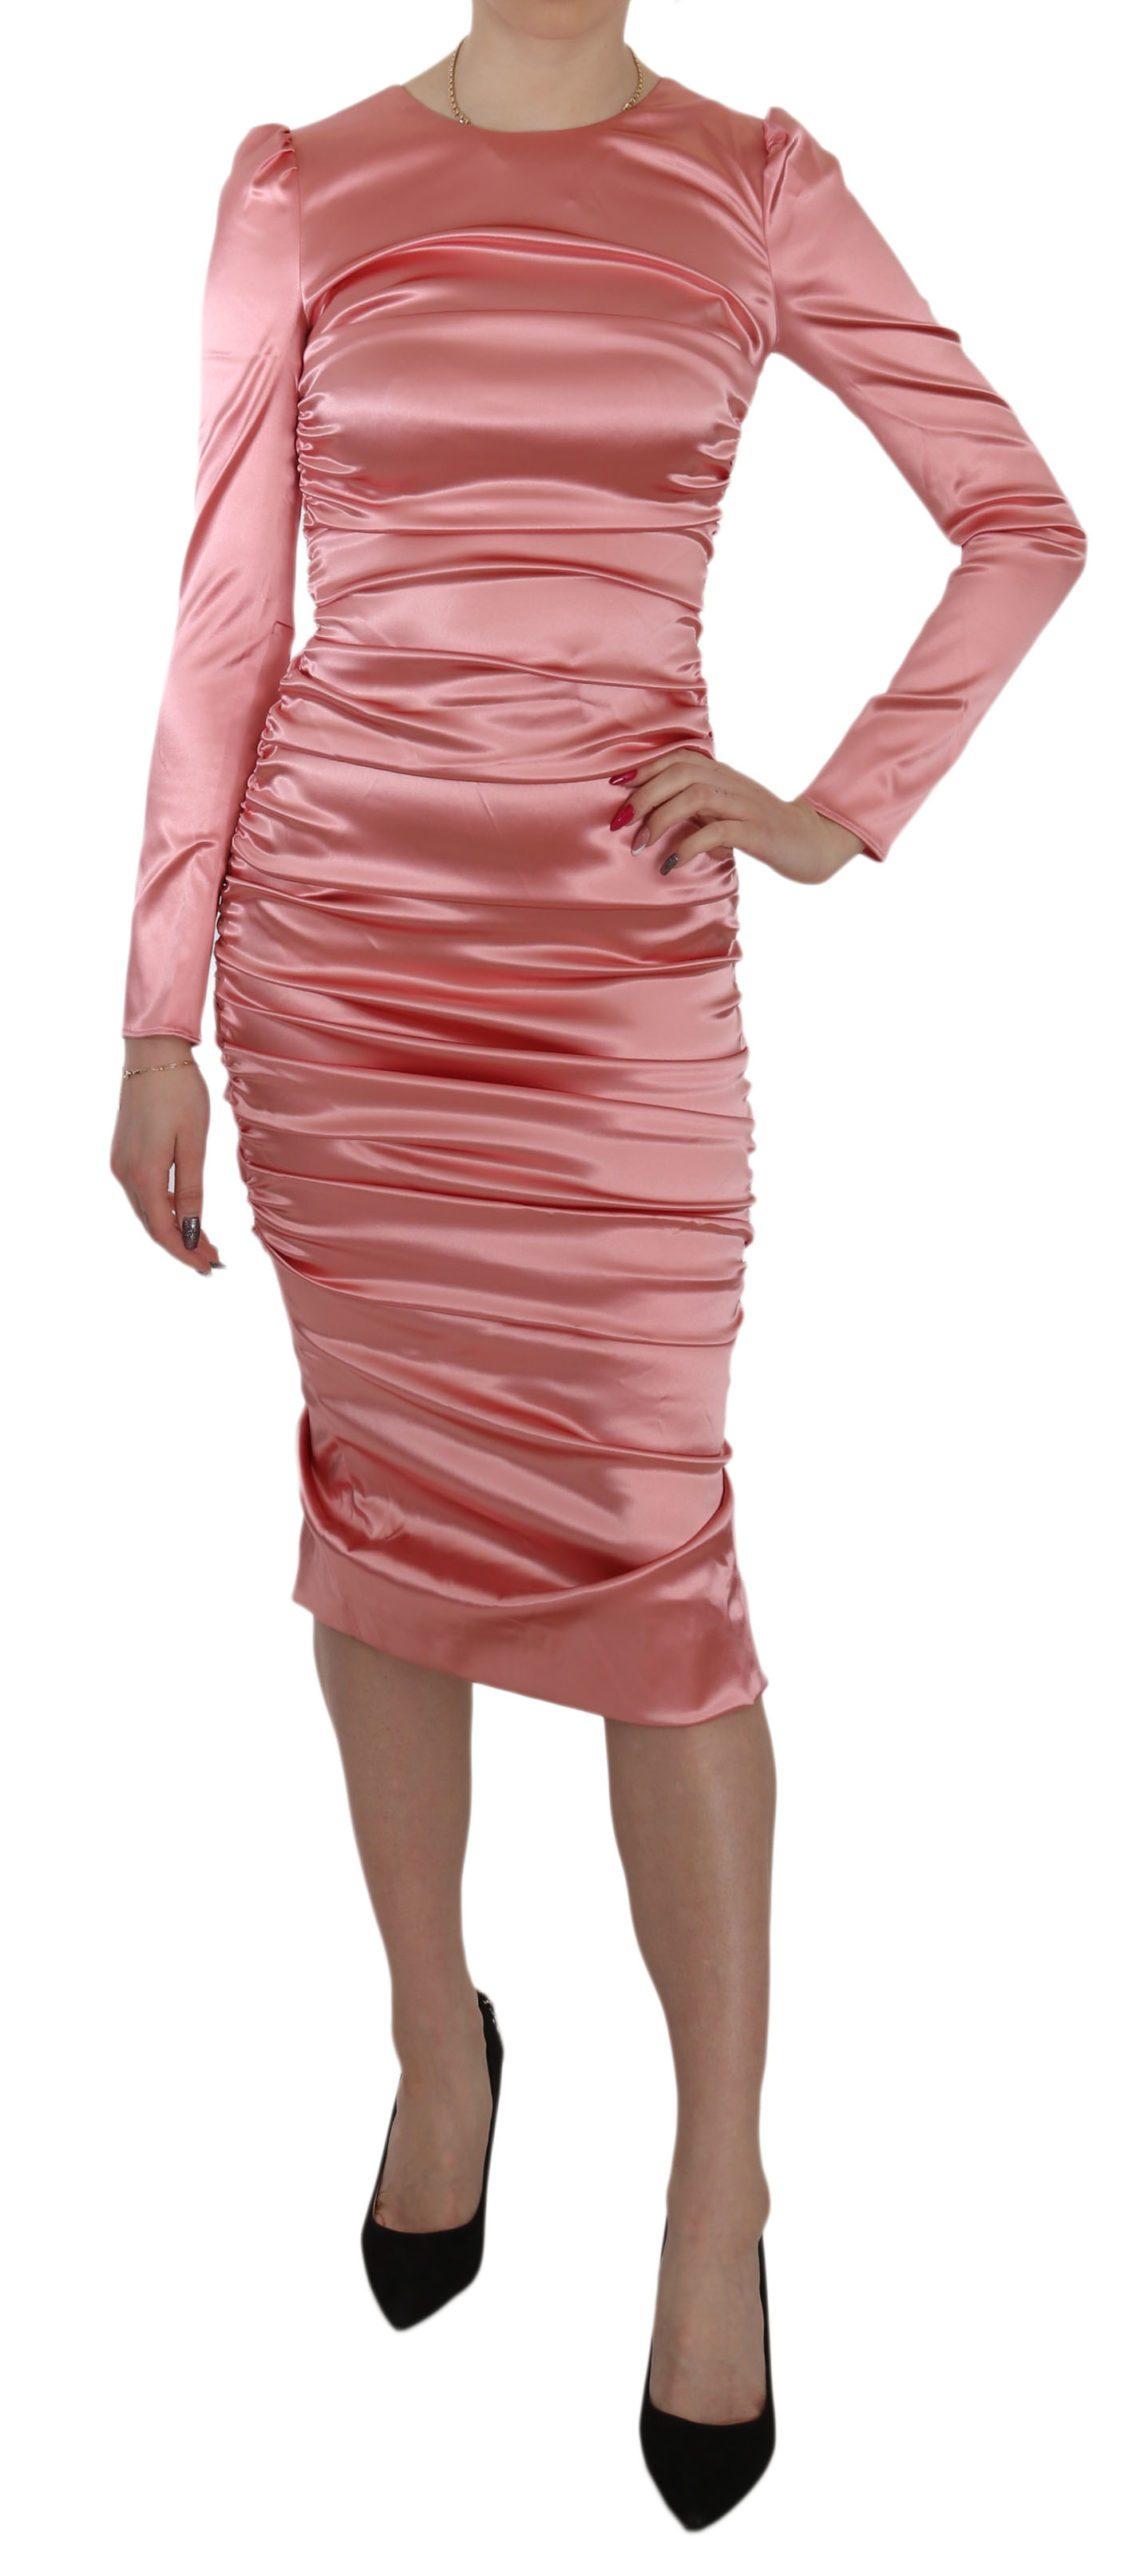 Dolce & Gabbana Women's LS Bodycon Sheath Dress Pink DR1936 - IT38 XS